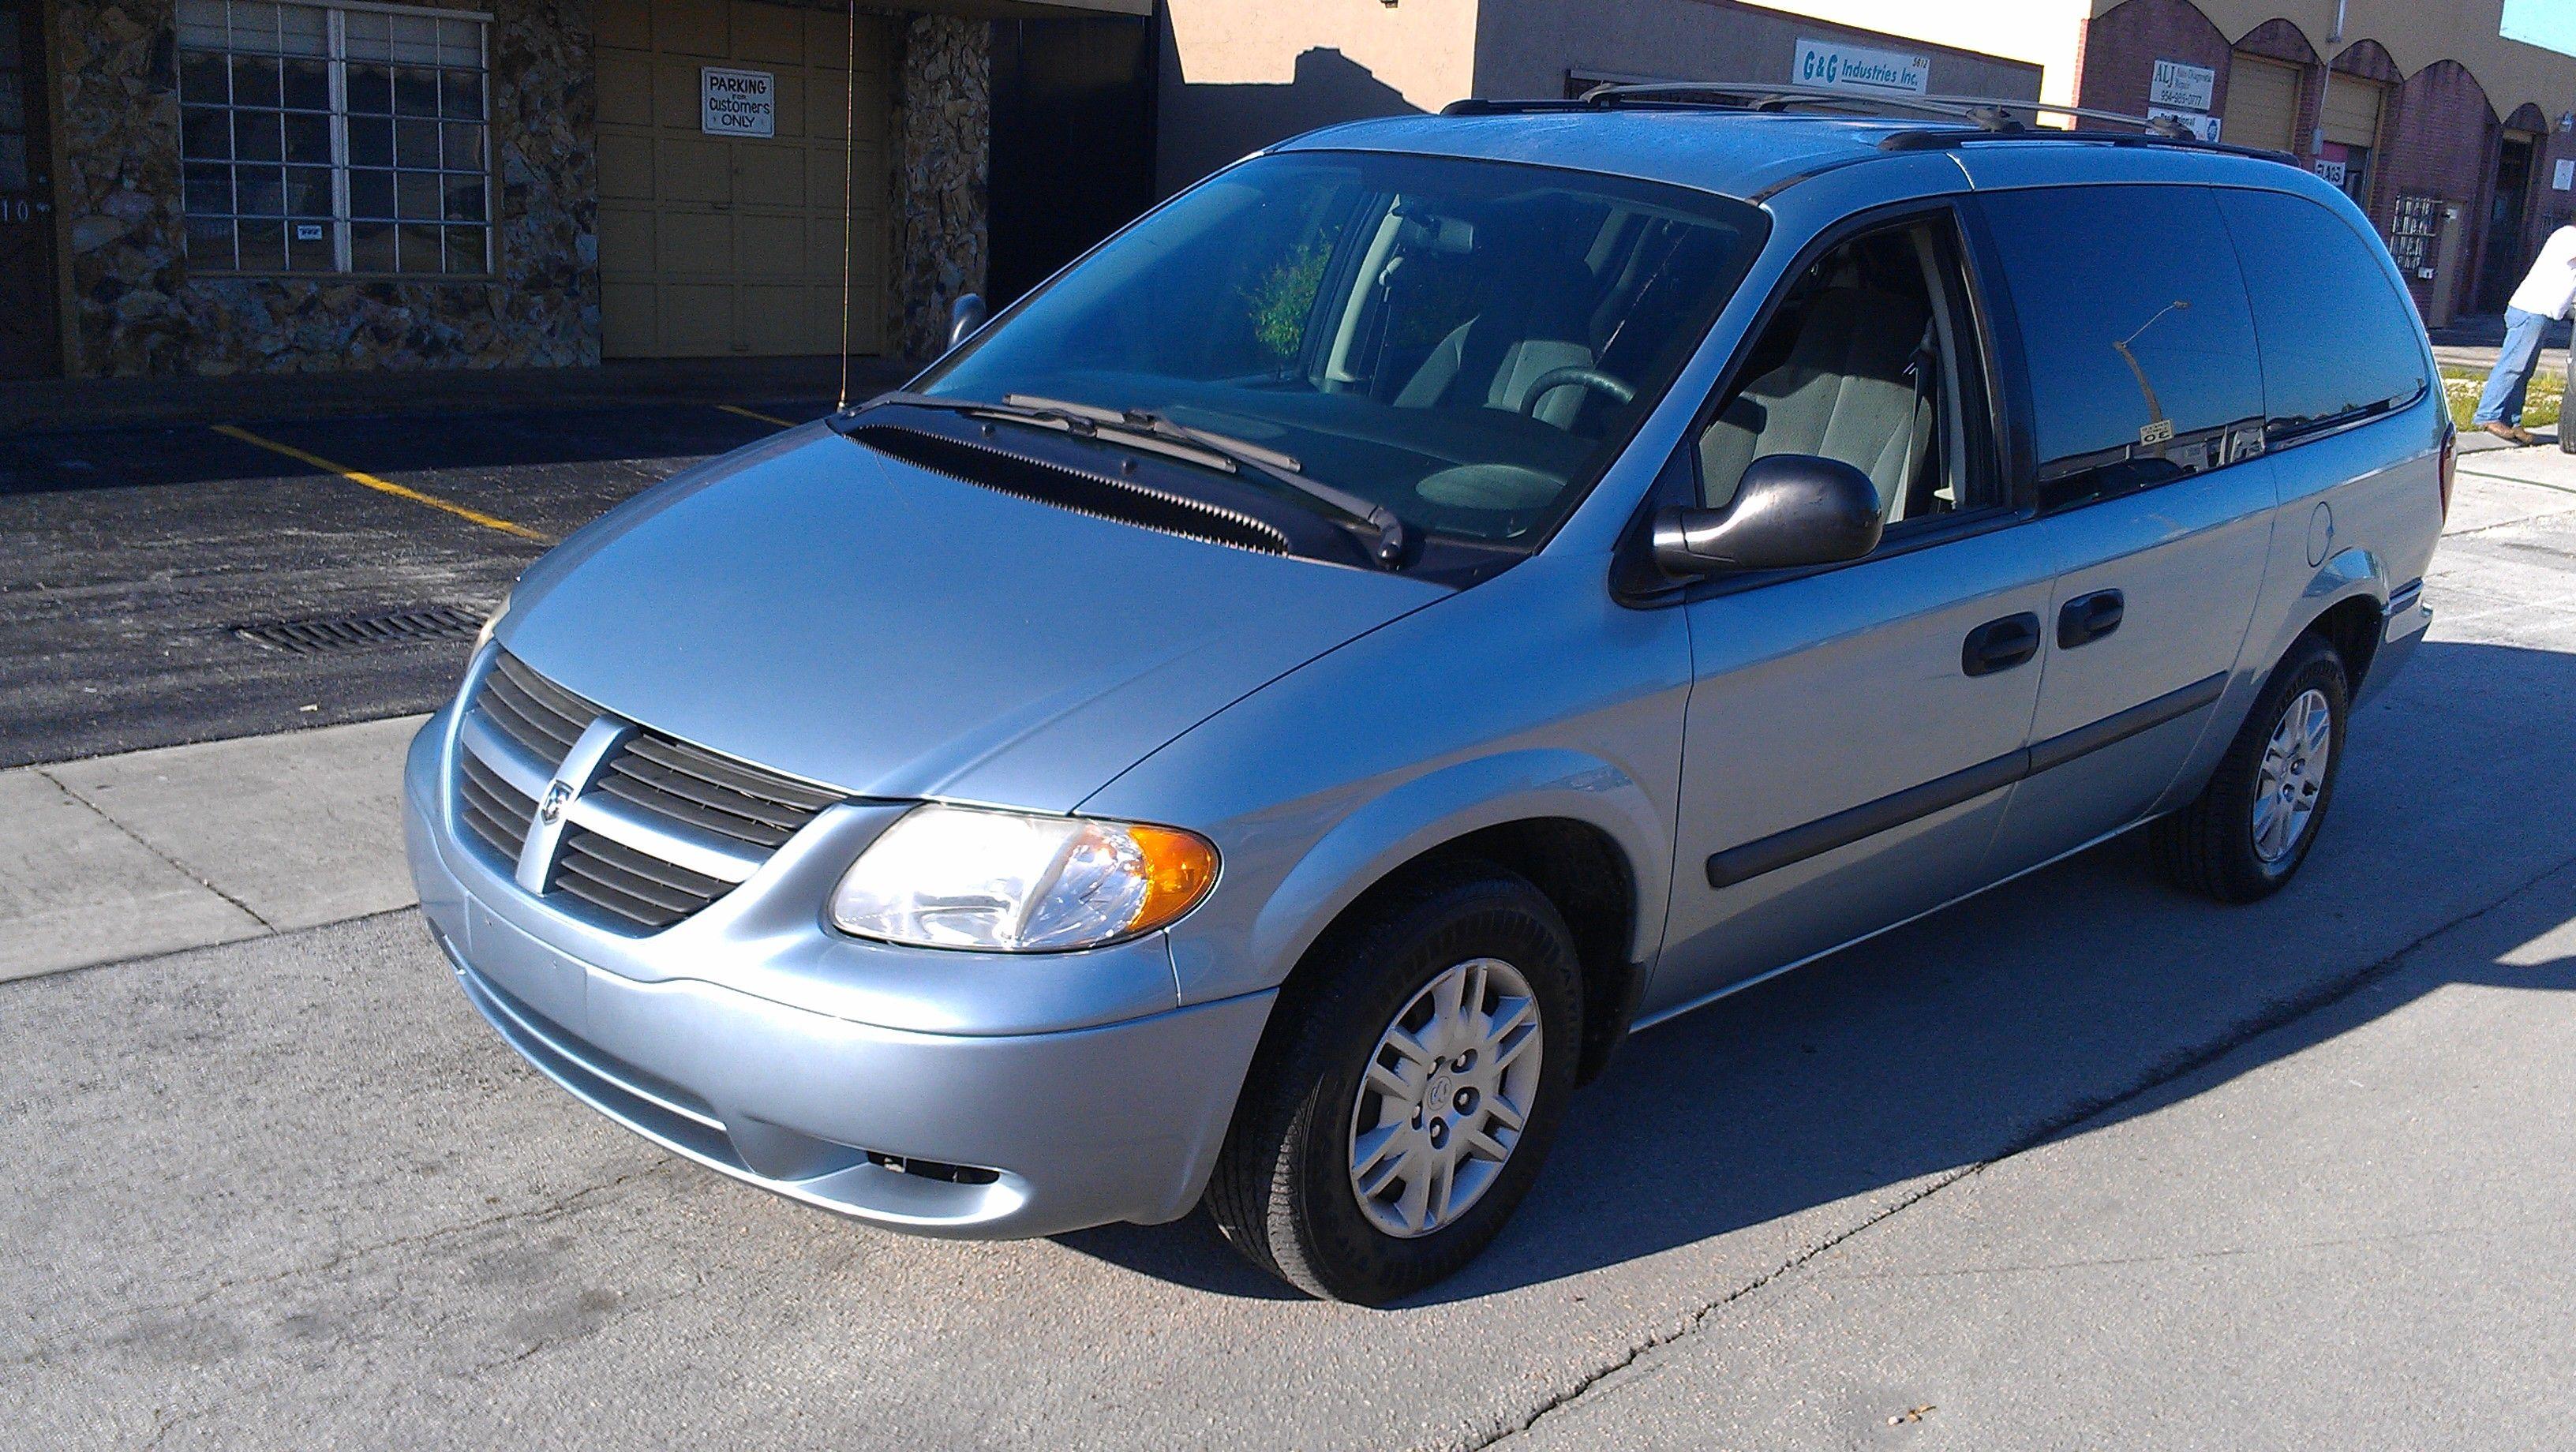 2005 Dodge Grand Caravan Minivan 94k Mileage Clean Title Vin